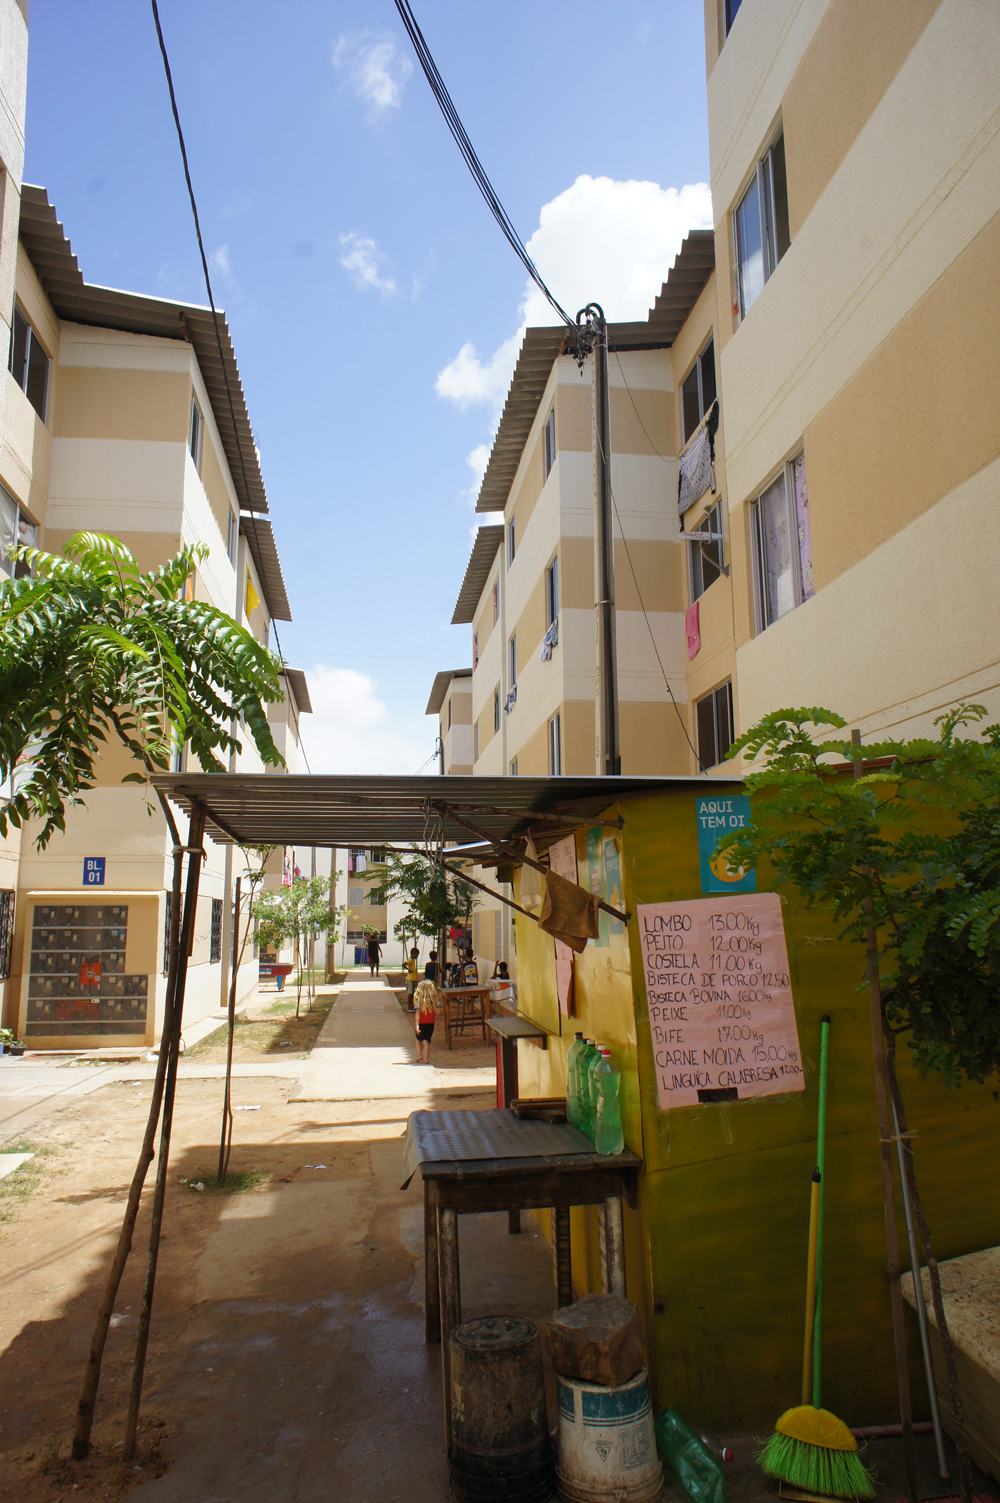 I Cidade Jardim finner du alt fra småbarer, frisører, kafé og butikker som beboerne selv drifter. Foto: Astrid Fadnes